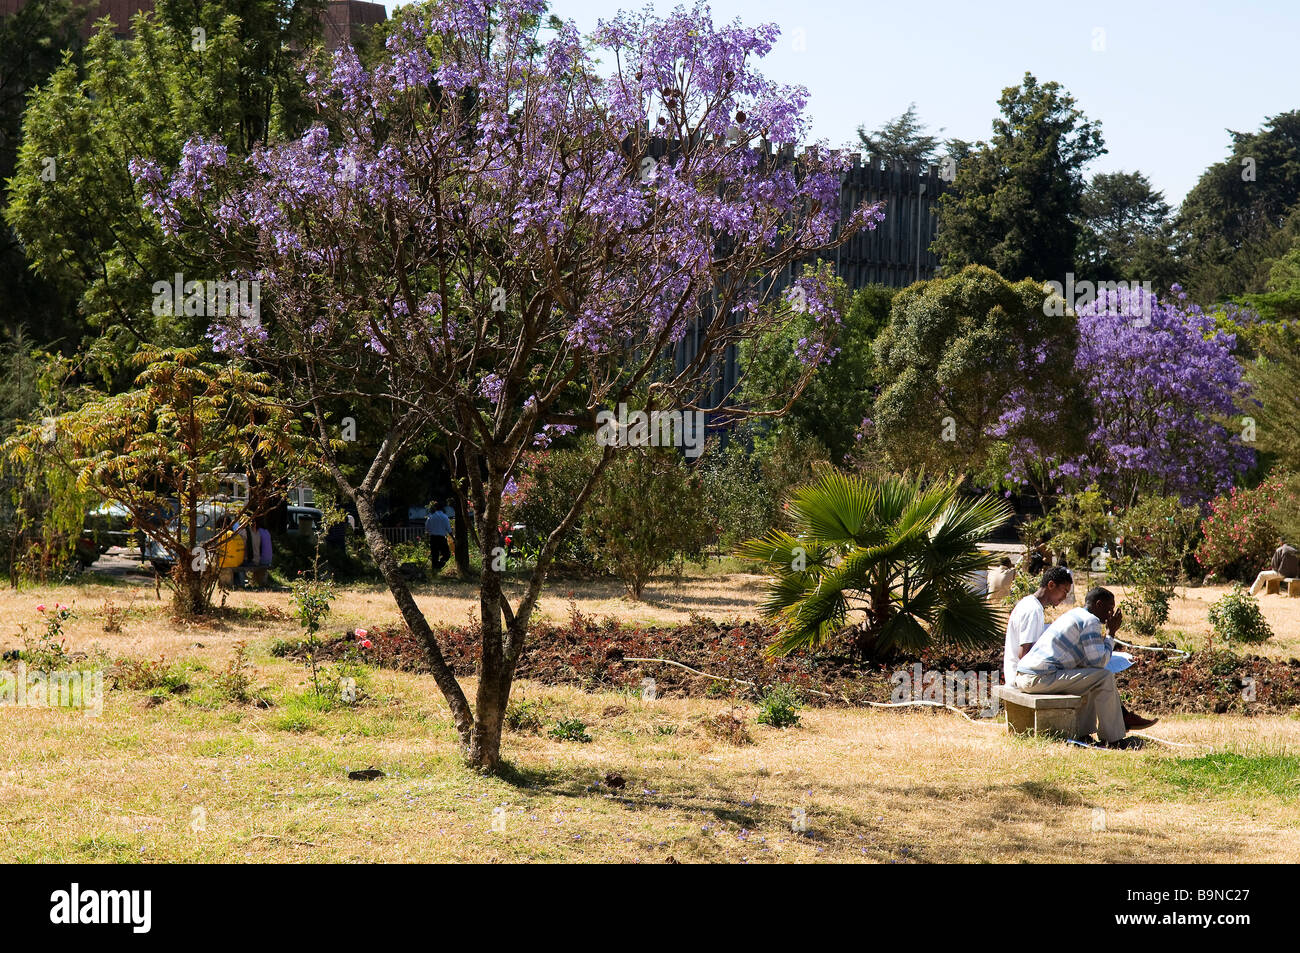 Ethiopia, Addis Ababa University Stock Photo: 23212735 - Alamy